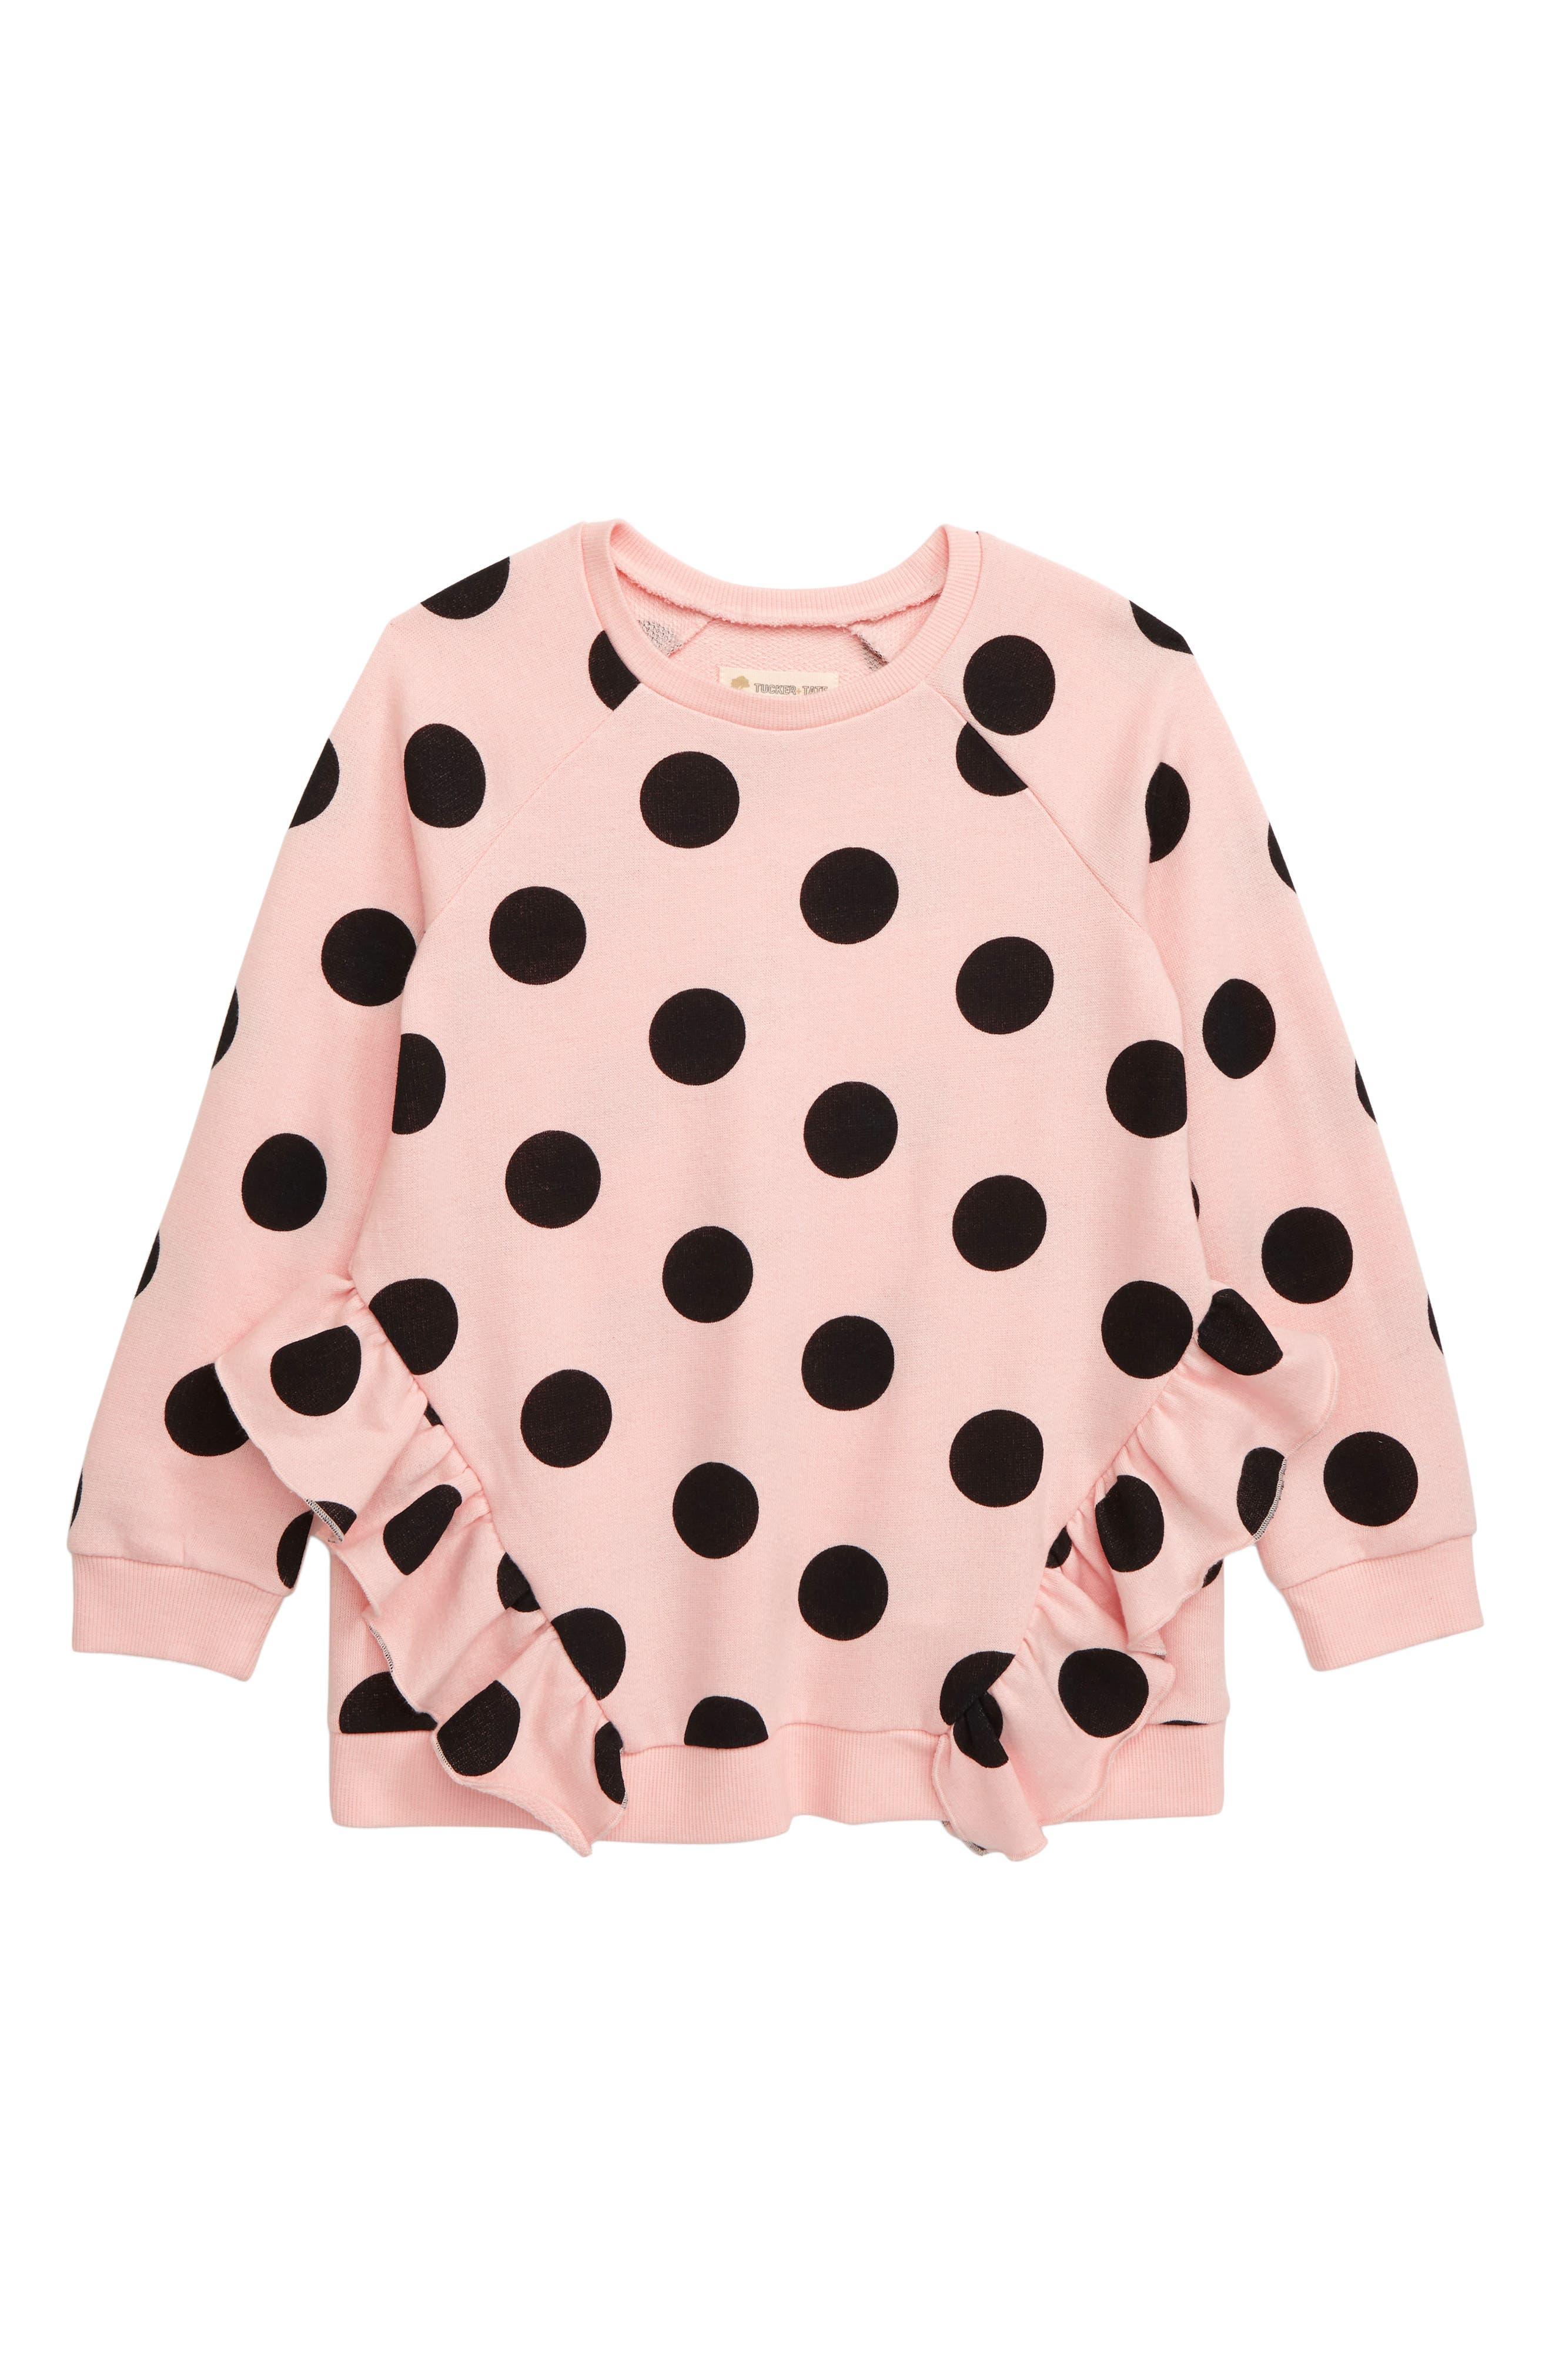 Toddler Girls Tucker  Tate Ruffle Fleece Tunic Top Size 3T  Pink